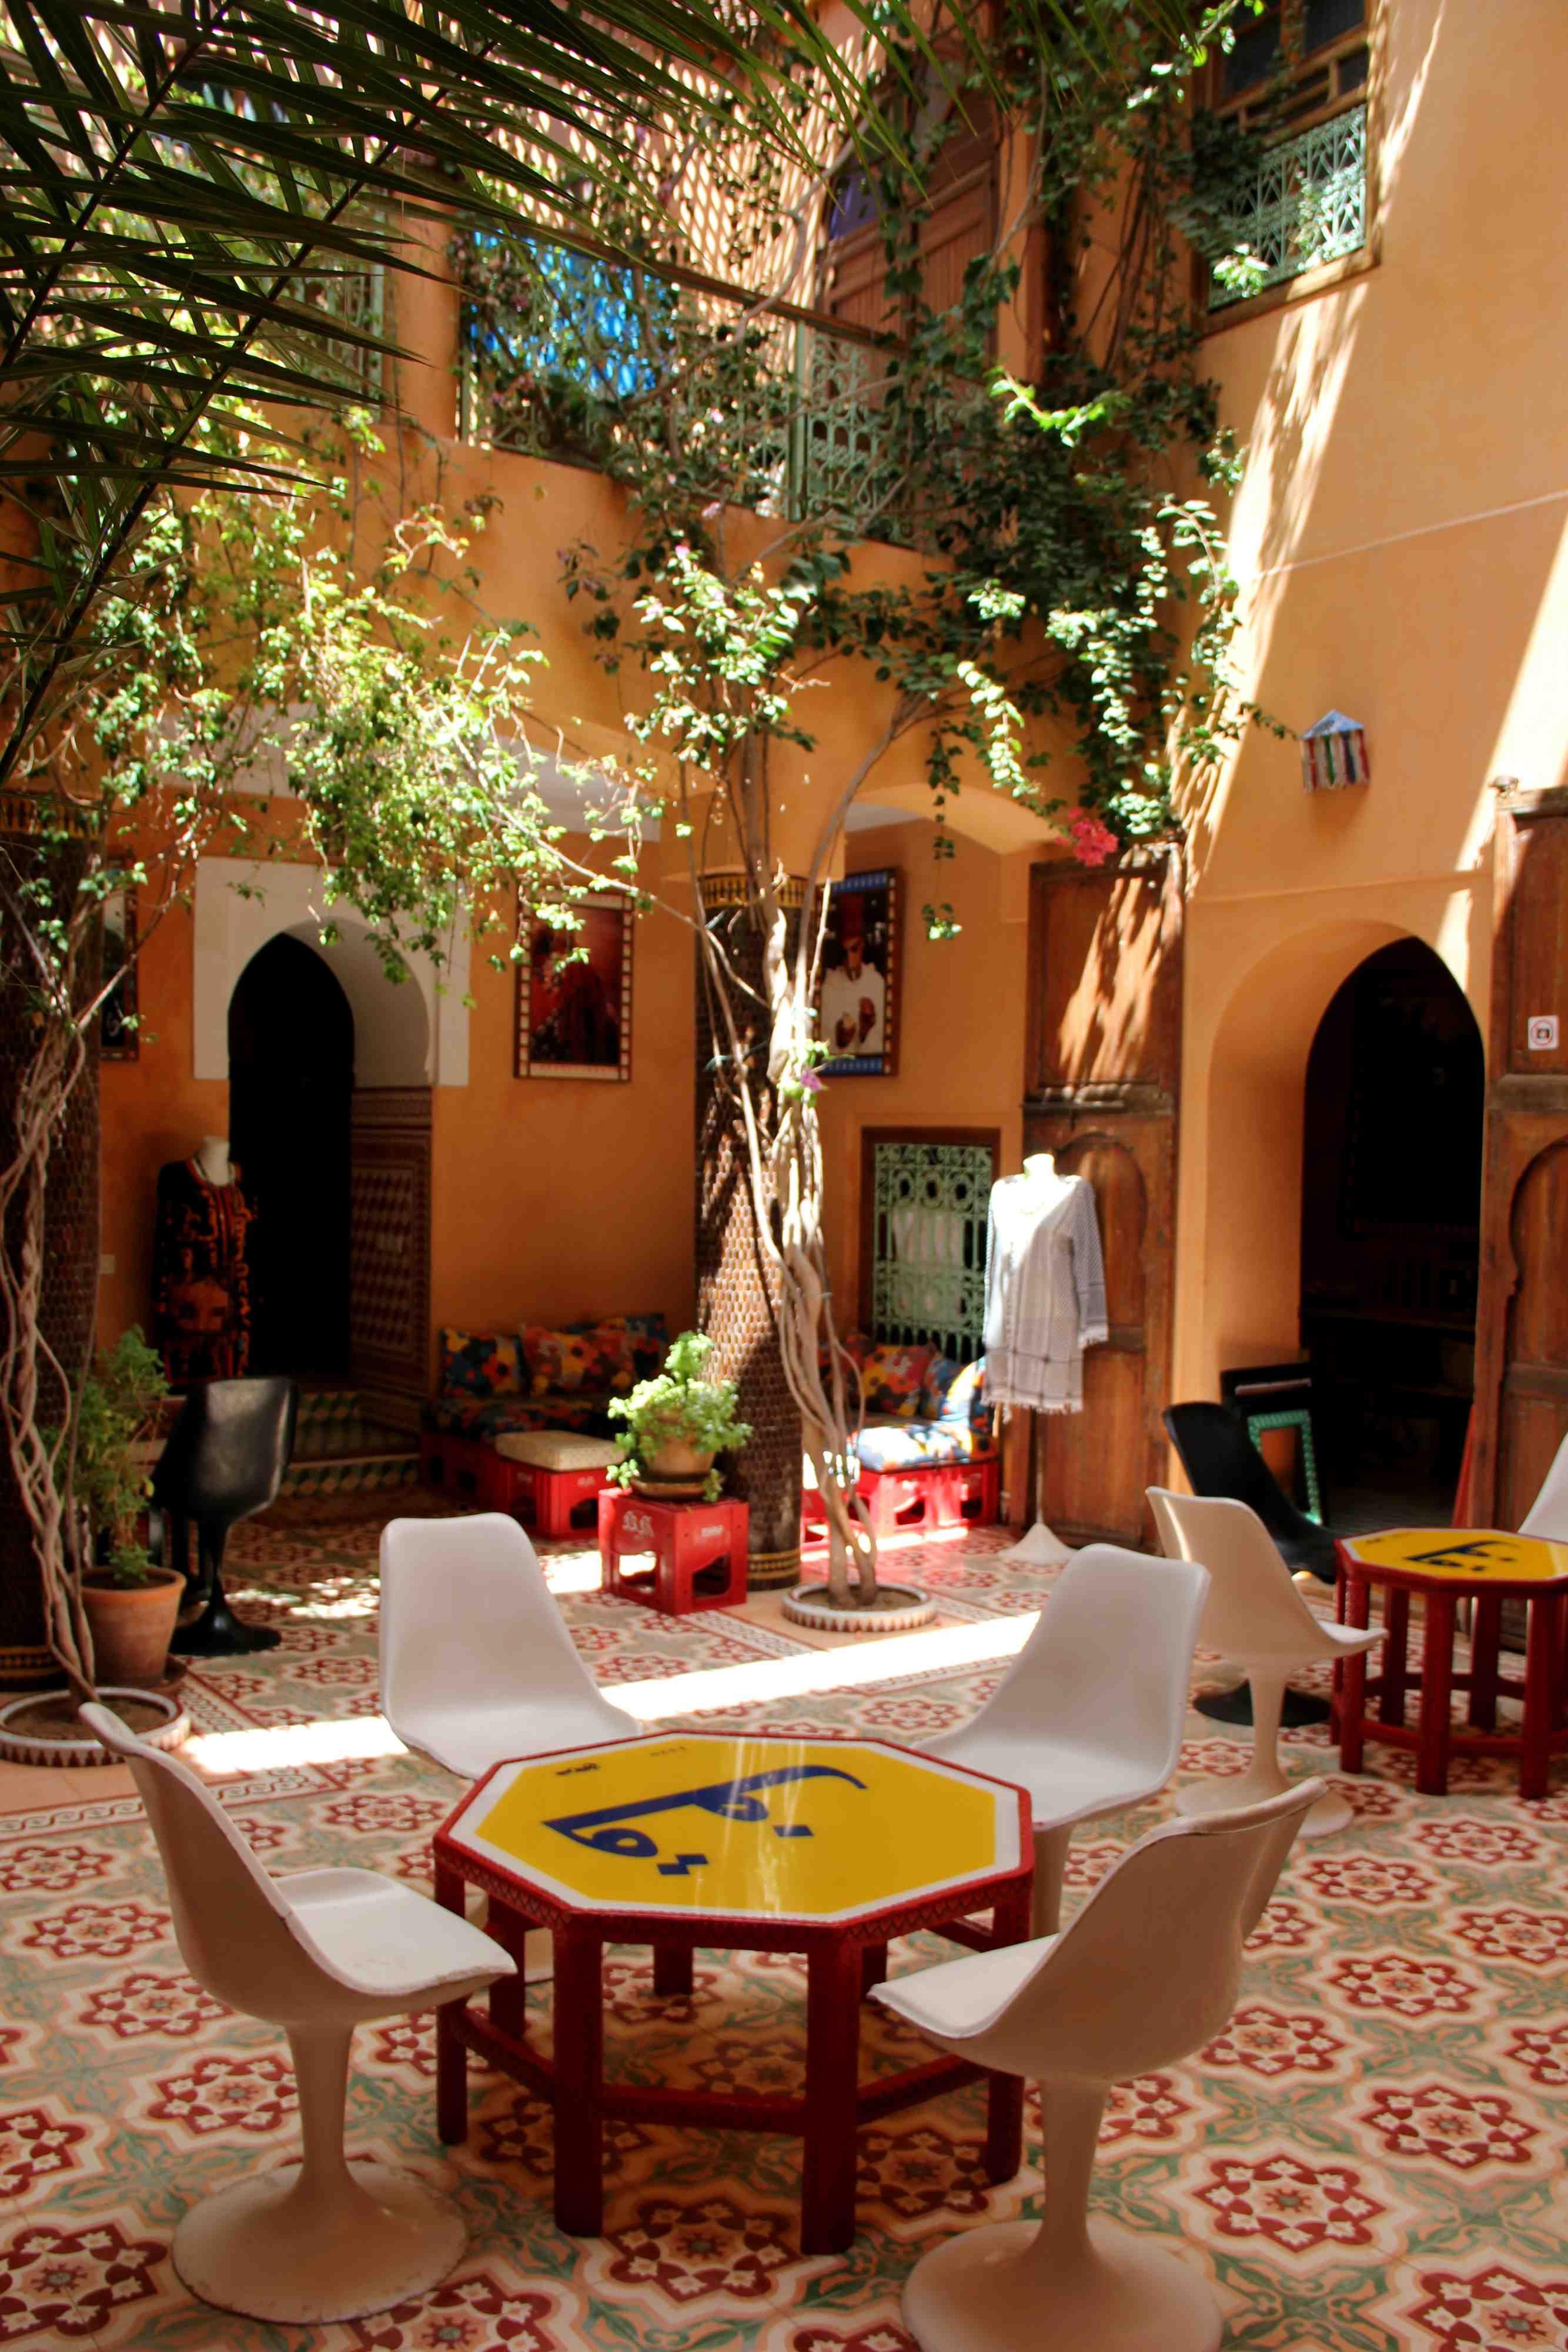 Marrakech Decoration D Interieur riad yima, cafe in marrakech (avec images) | marseillan